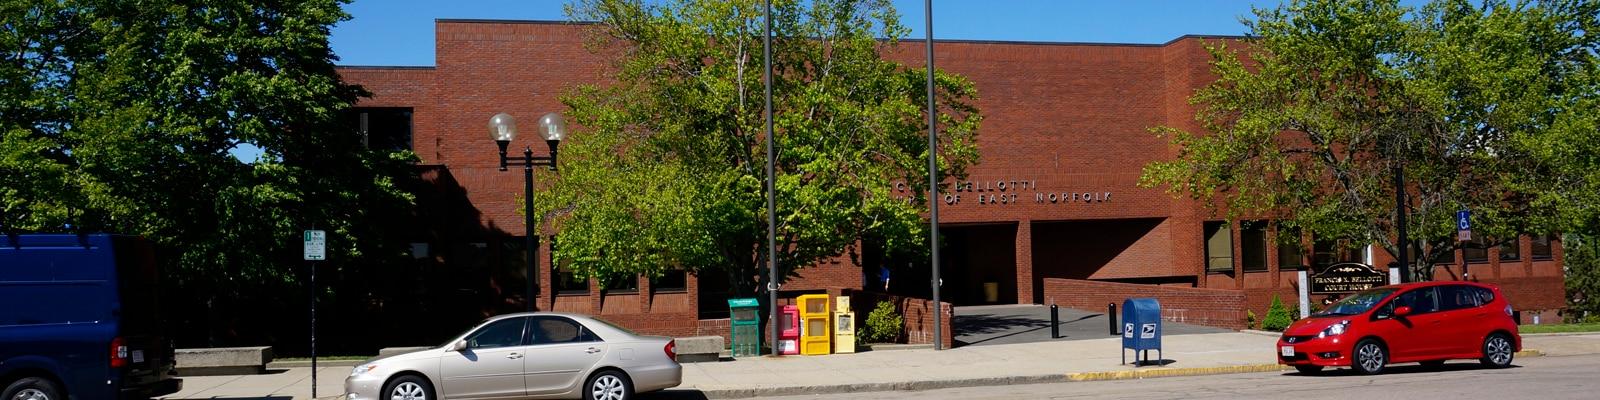 Quincy District Court   Mass gov